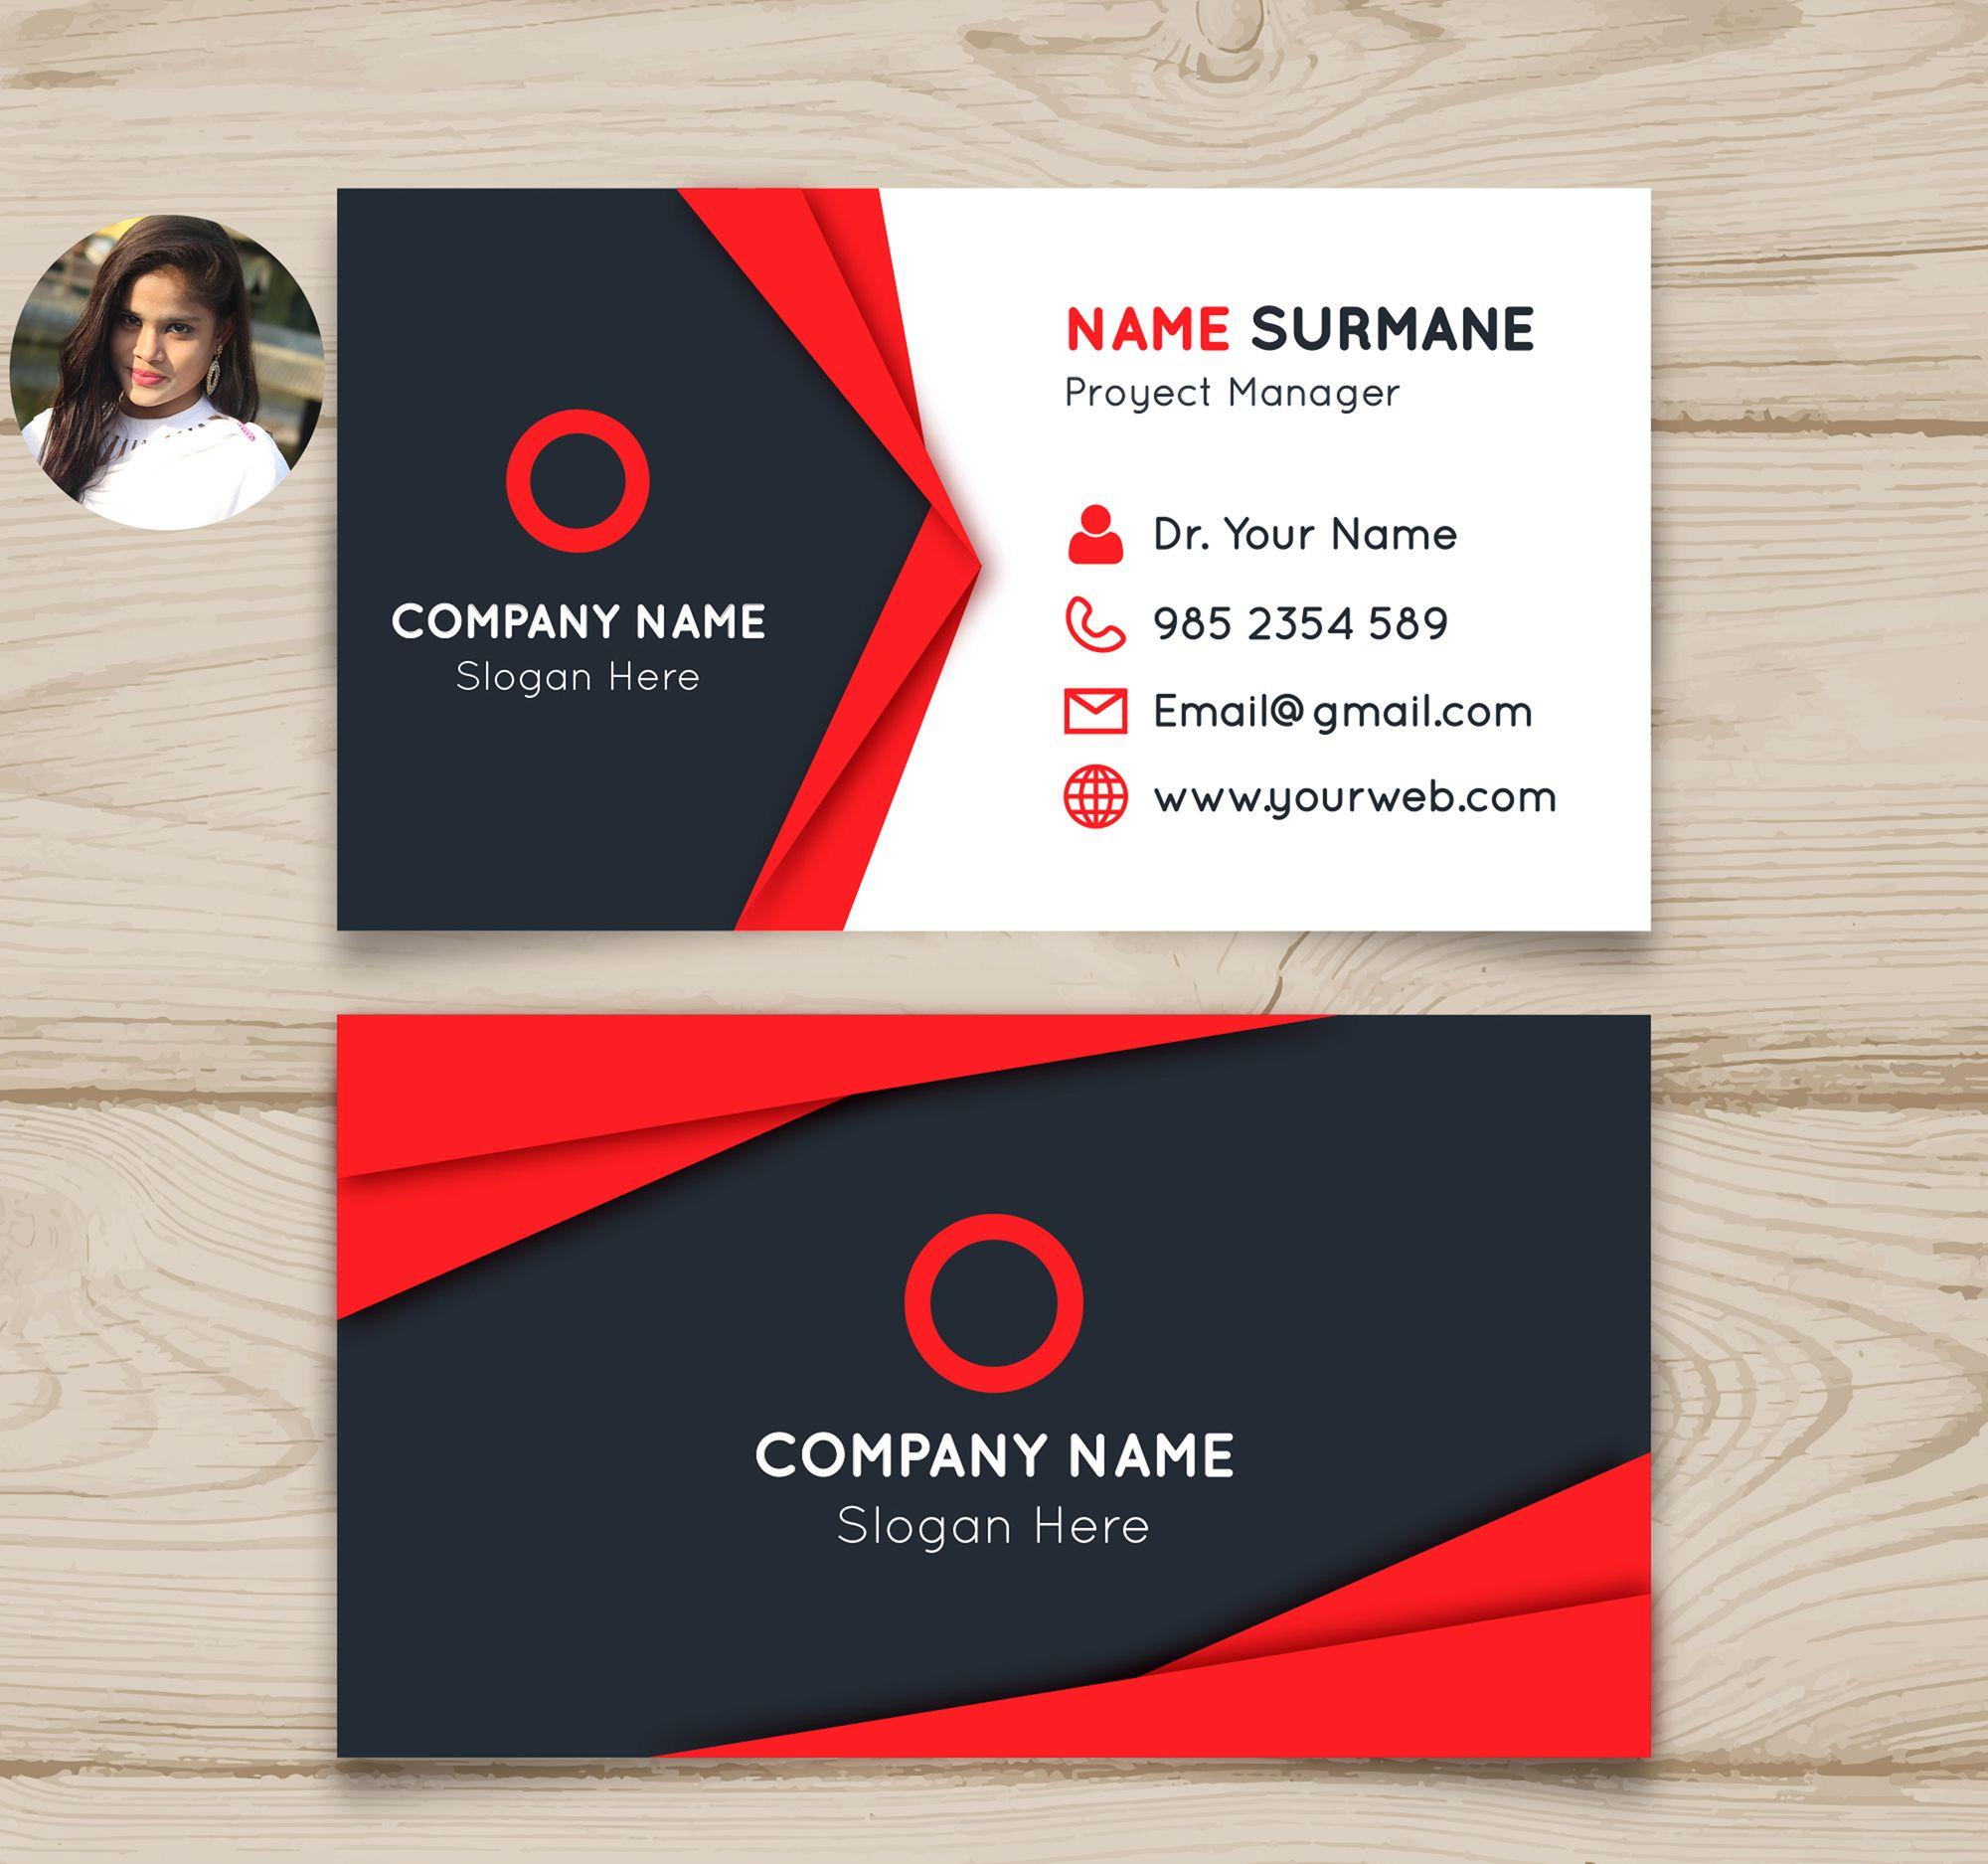 Business Card Design Business Card Design Business Card Design Black Free Business Card Design